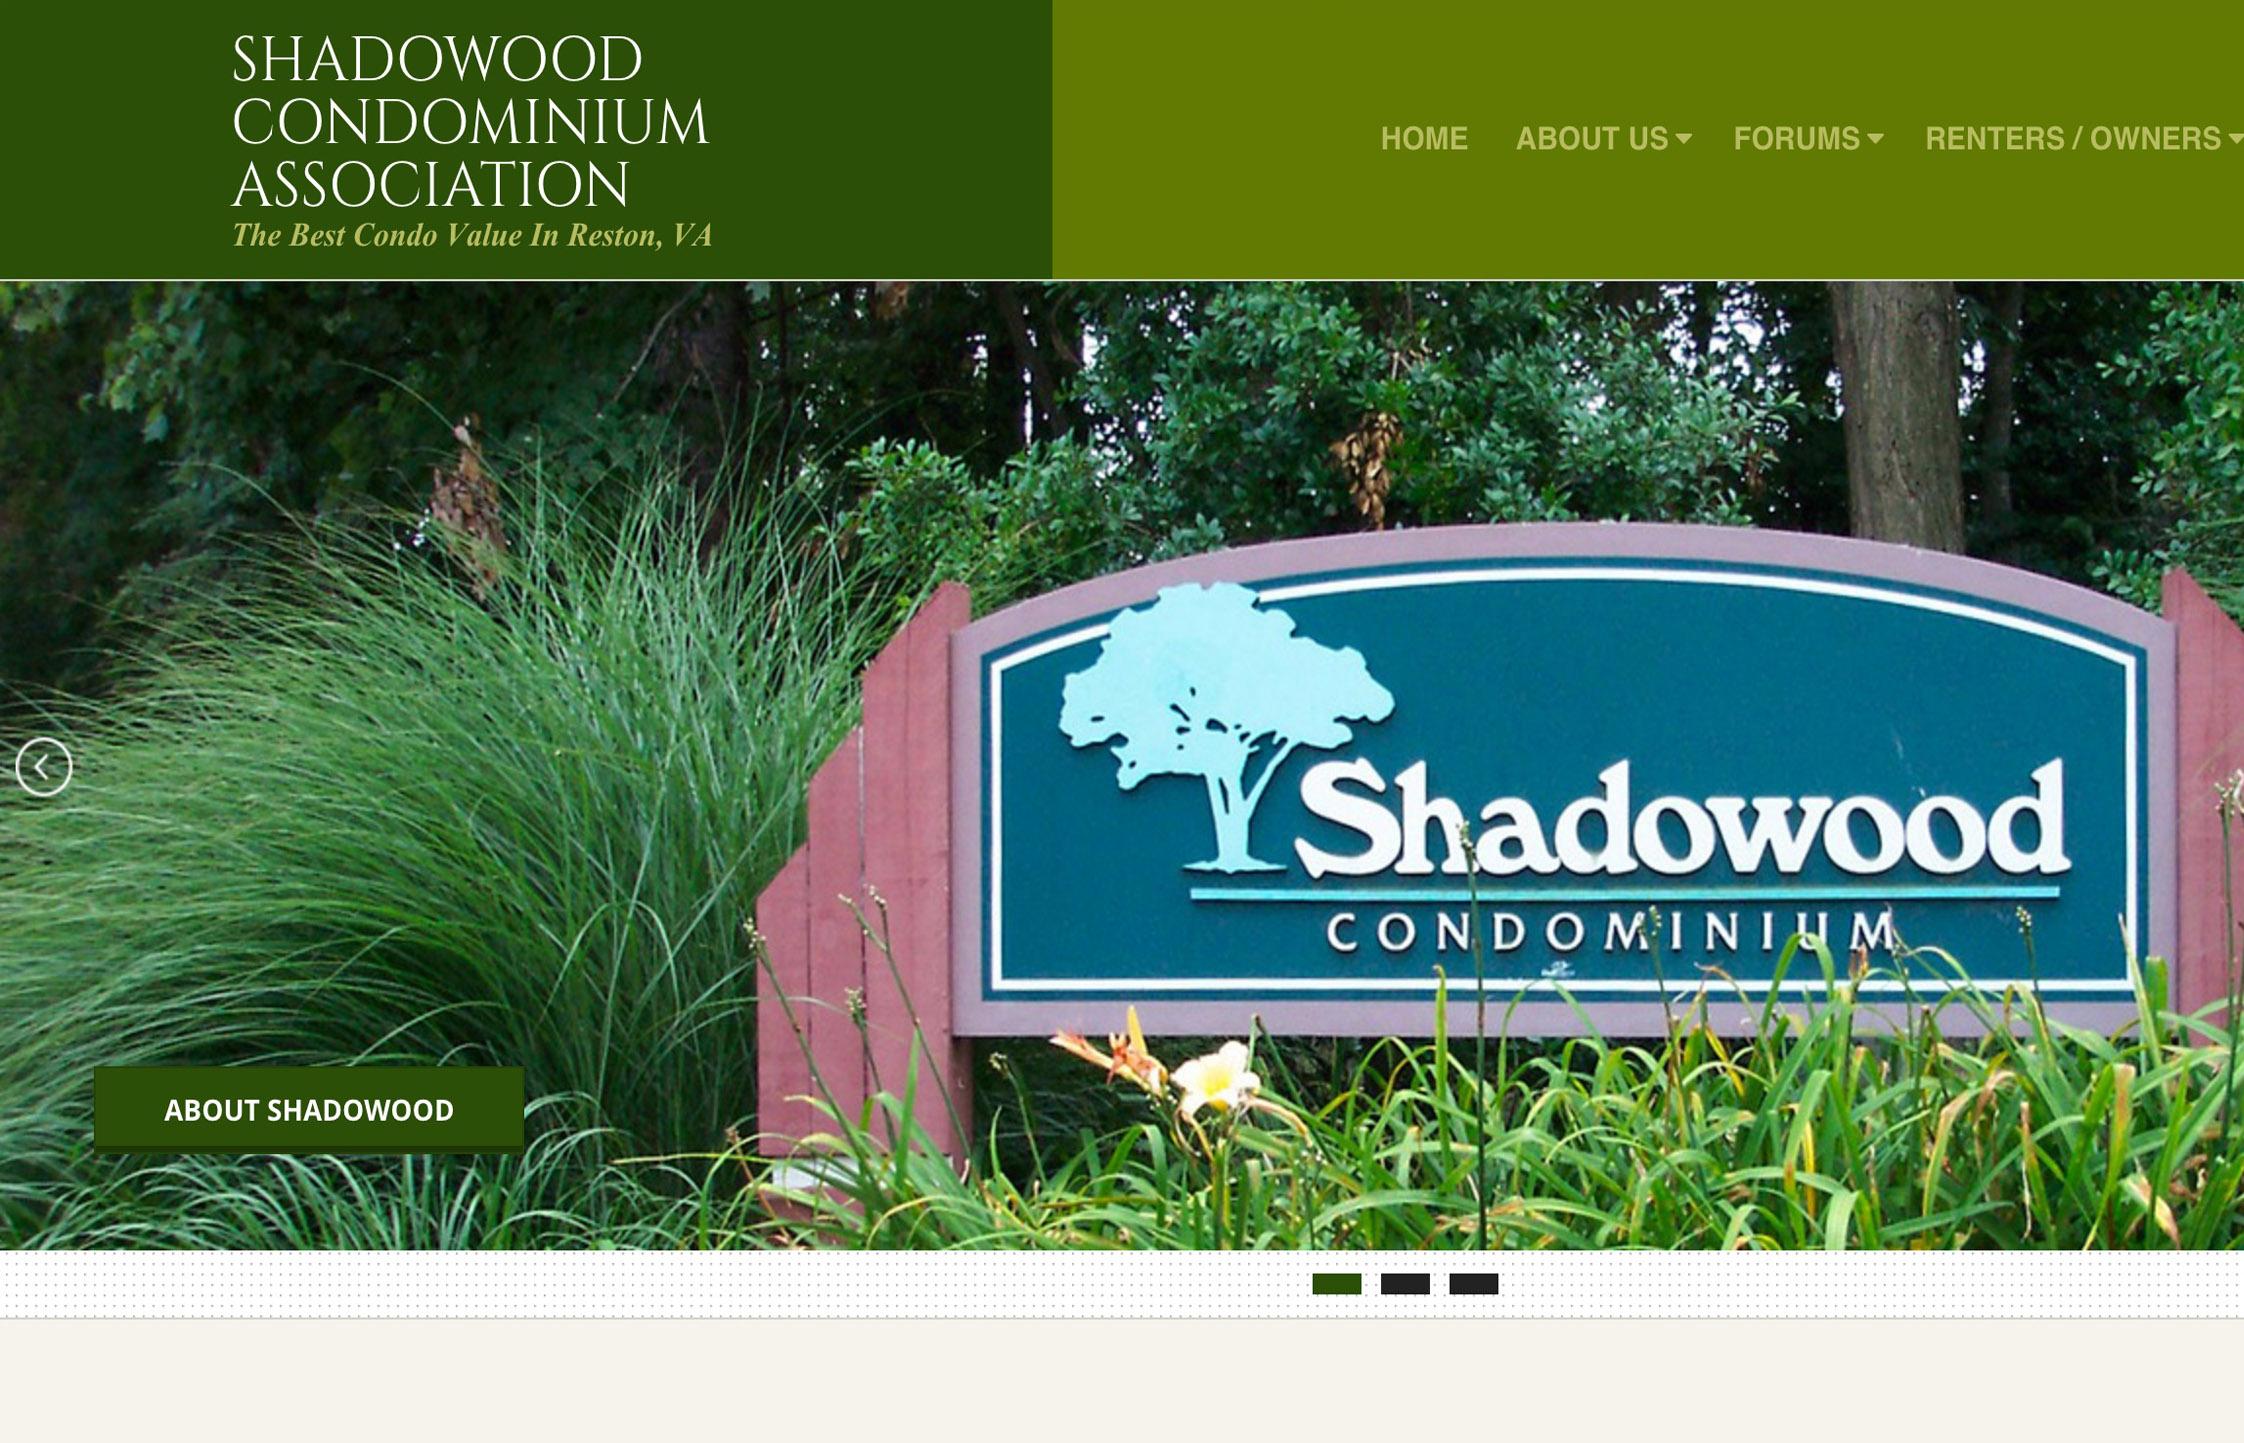 Shadowood Condominium Association